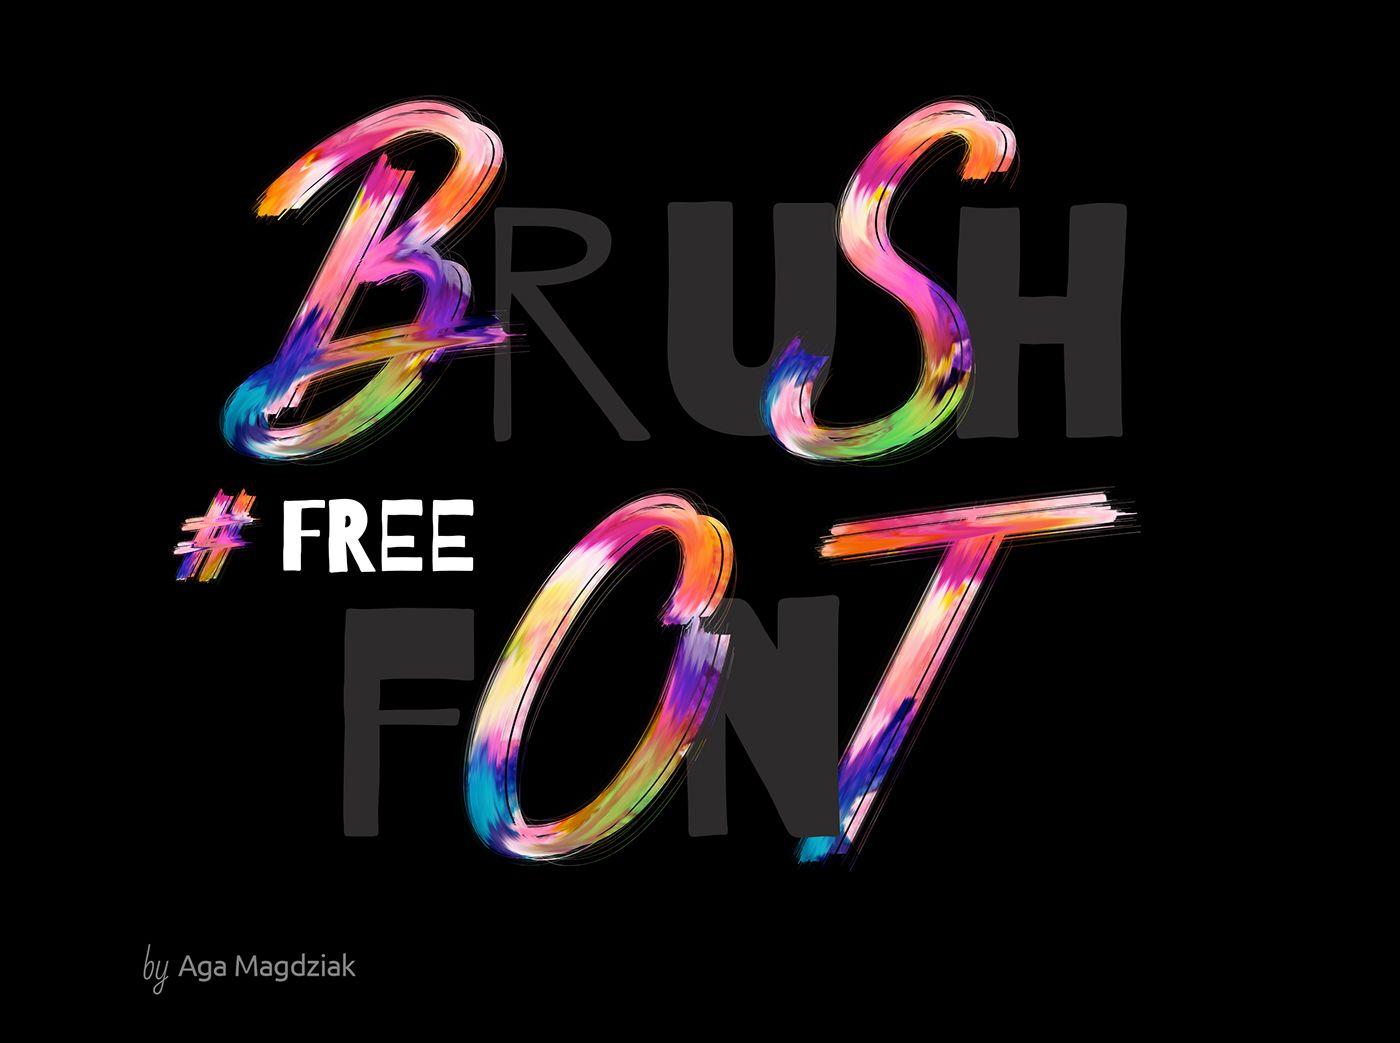 Free Download Brush Font Design Free Fonts For Designers